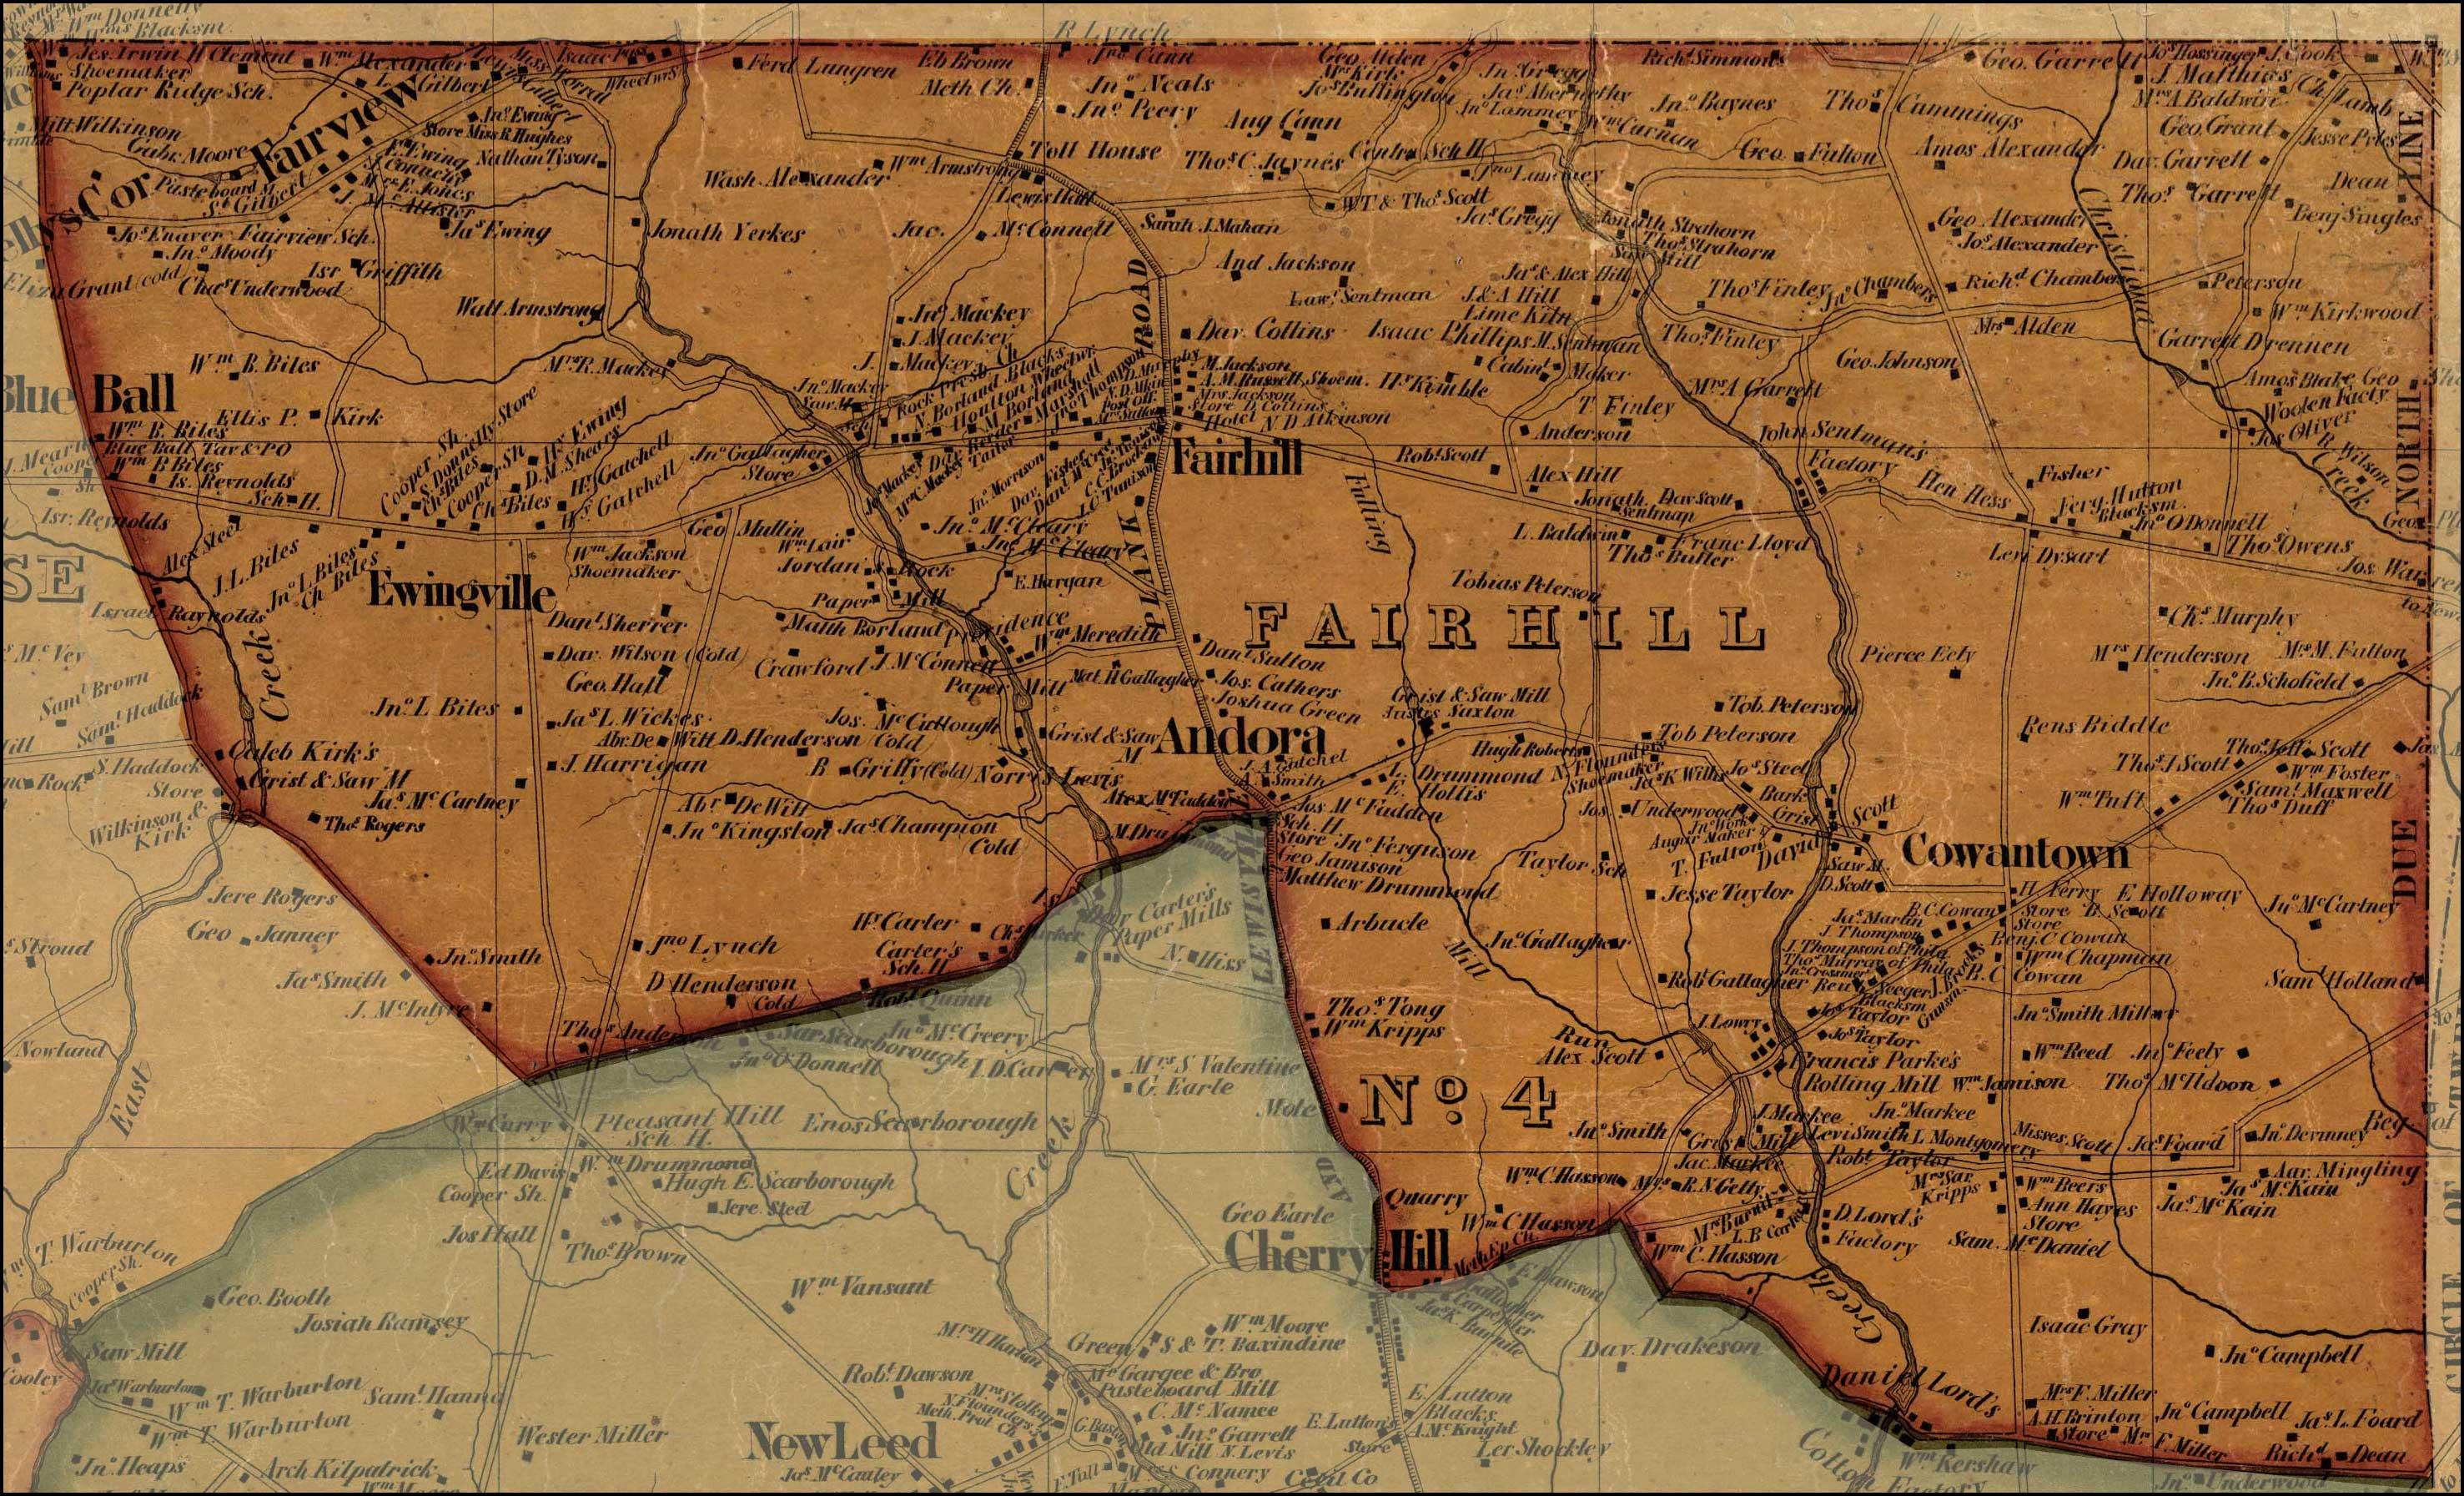 Simon J Martenet Map of Cecil County